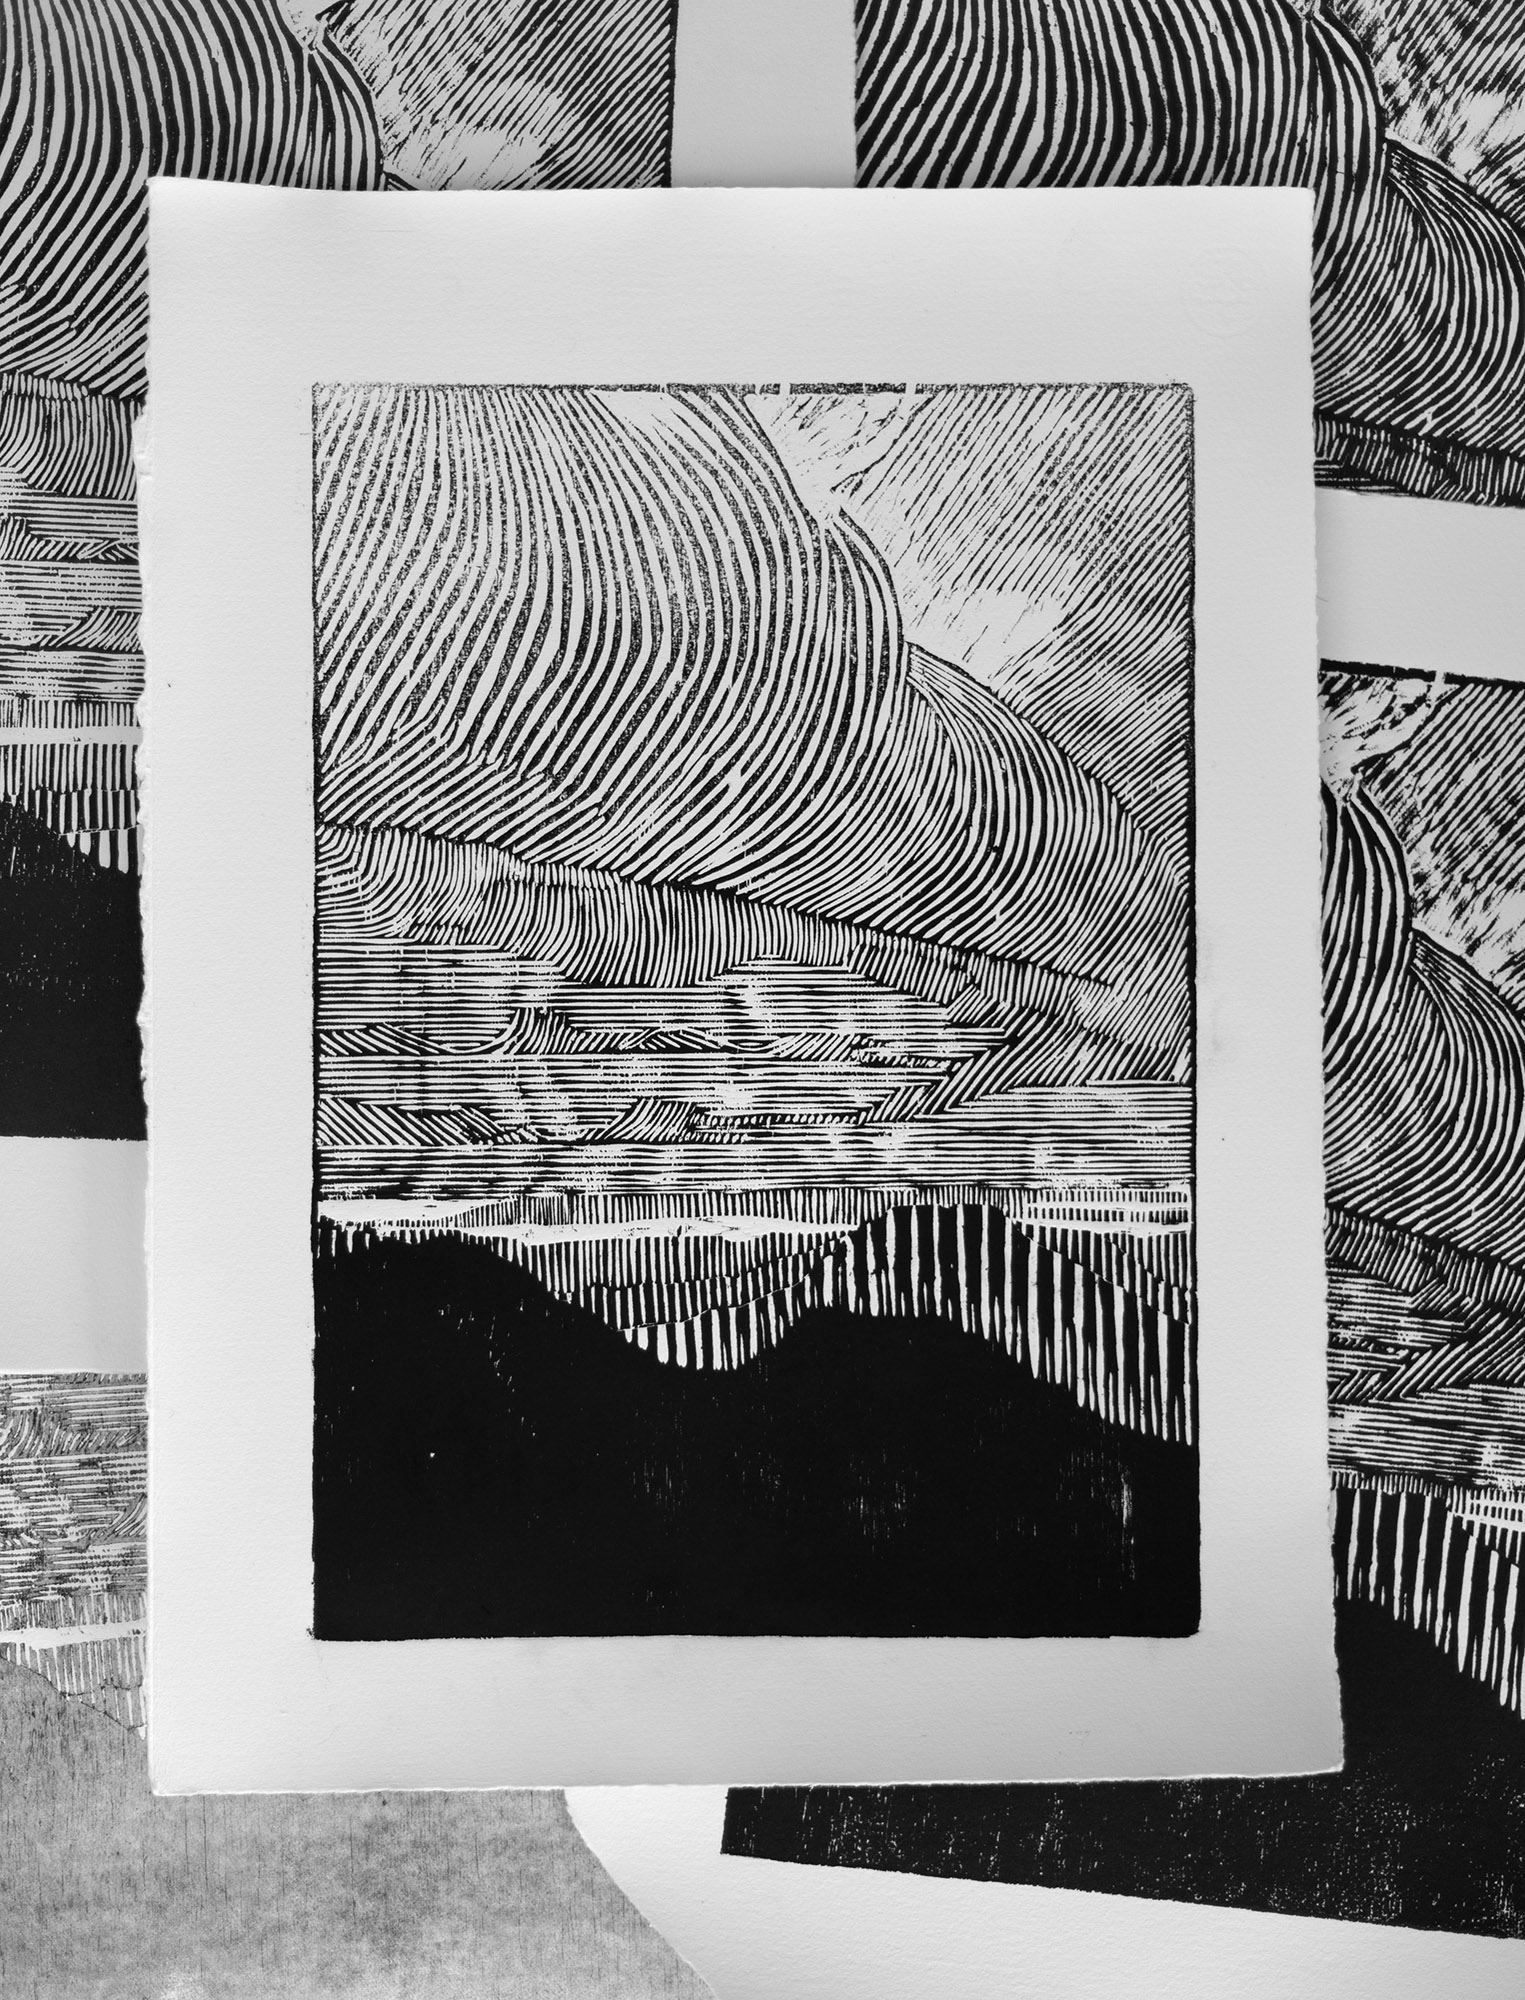 Blåmannen, woodcut print, 42 x 30 cm, 2017